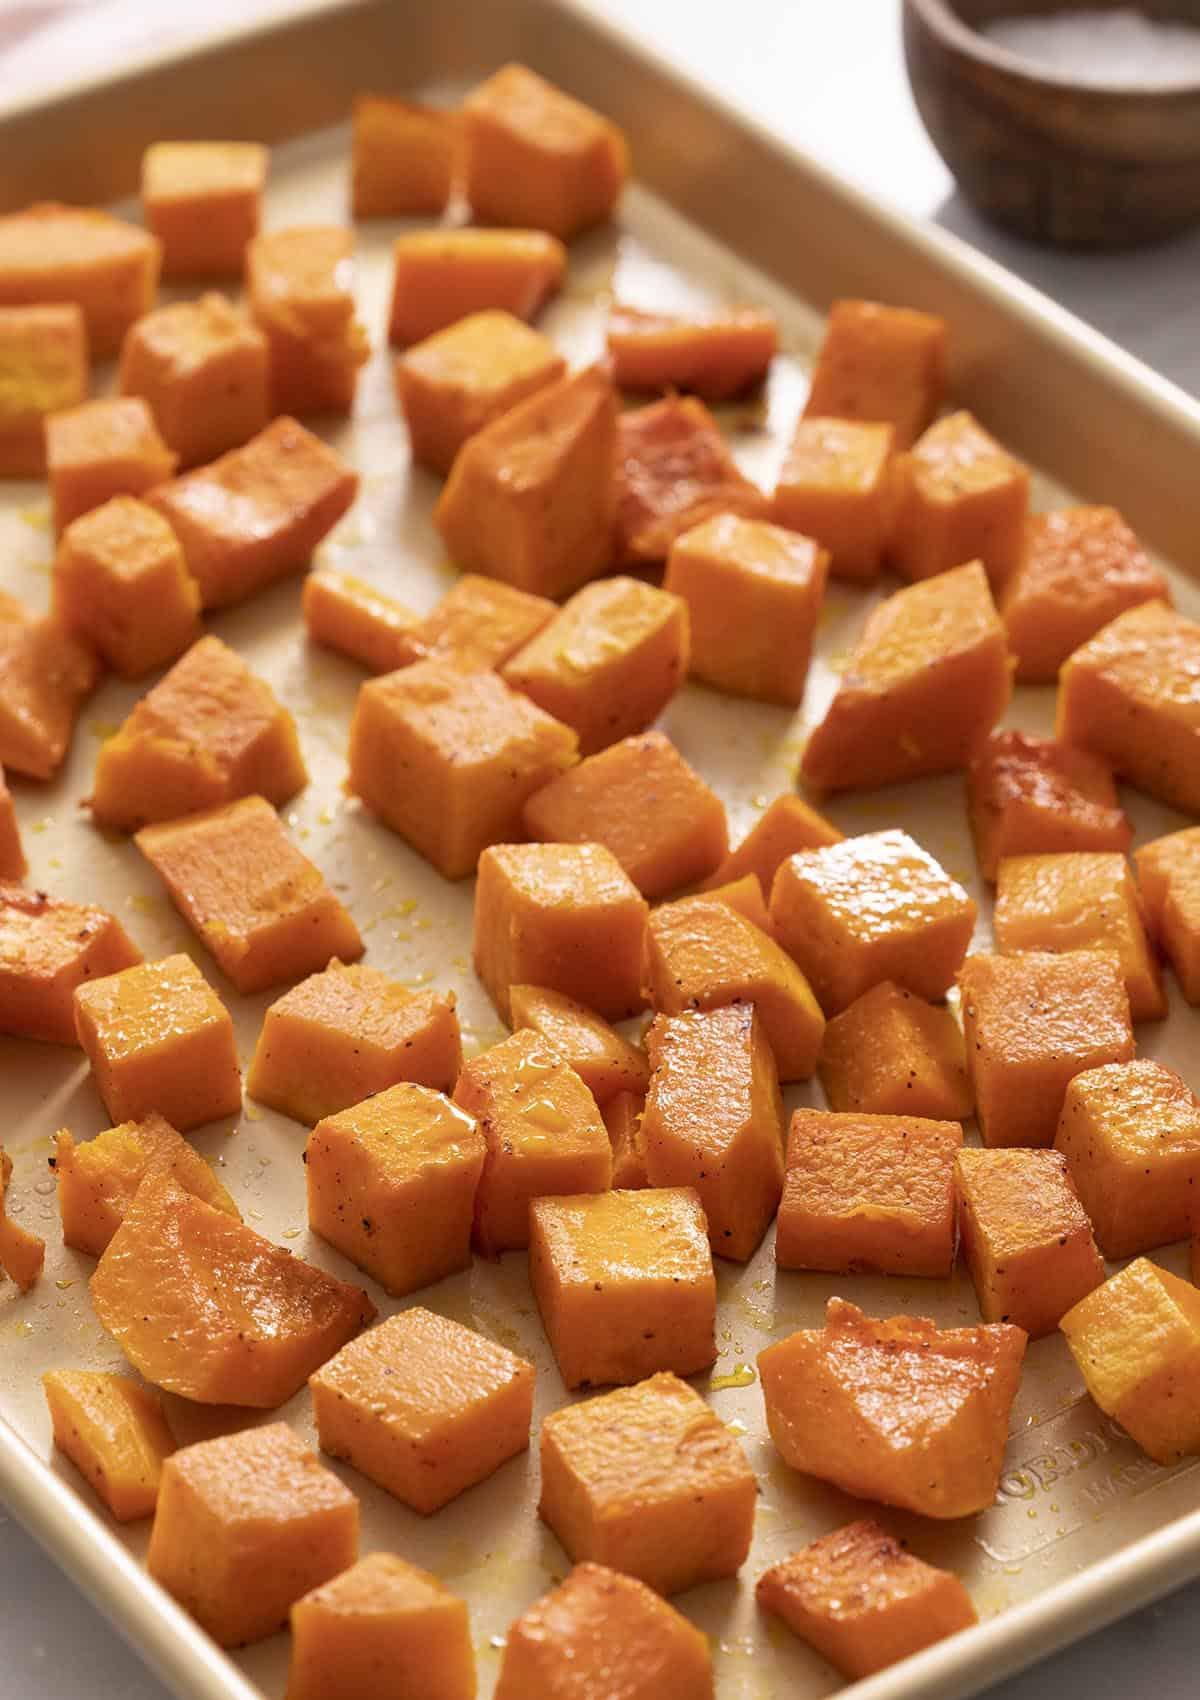 Roasted butternut squash pieces on a golden baking sheet.